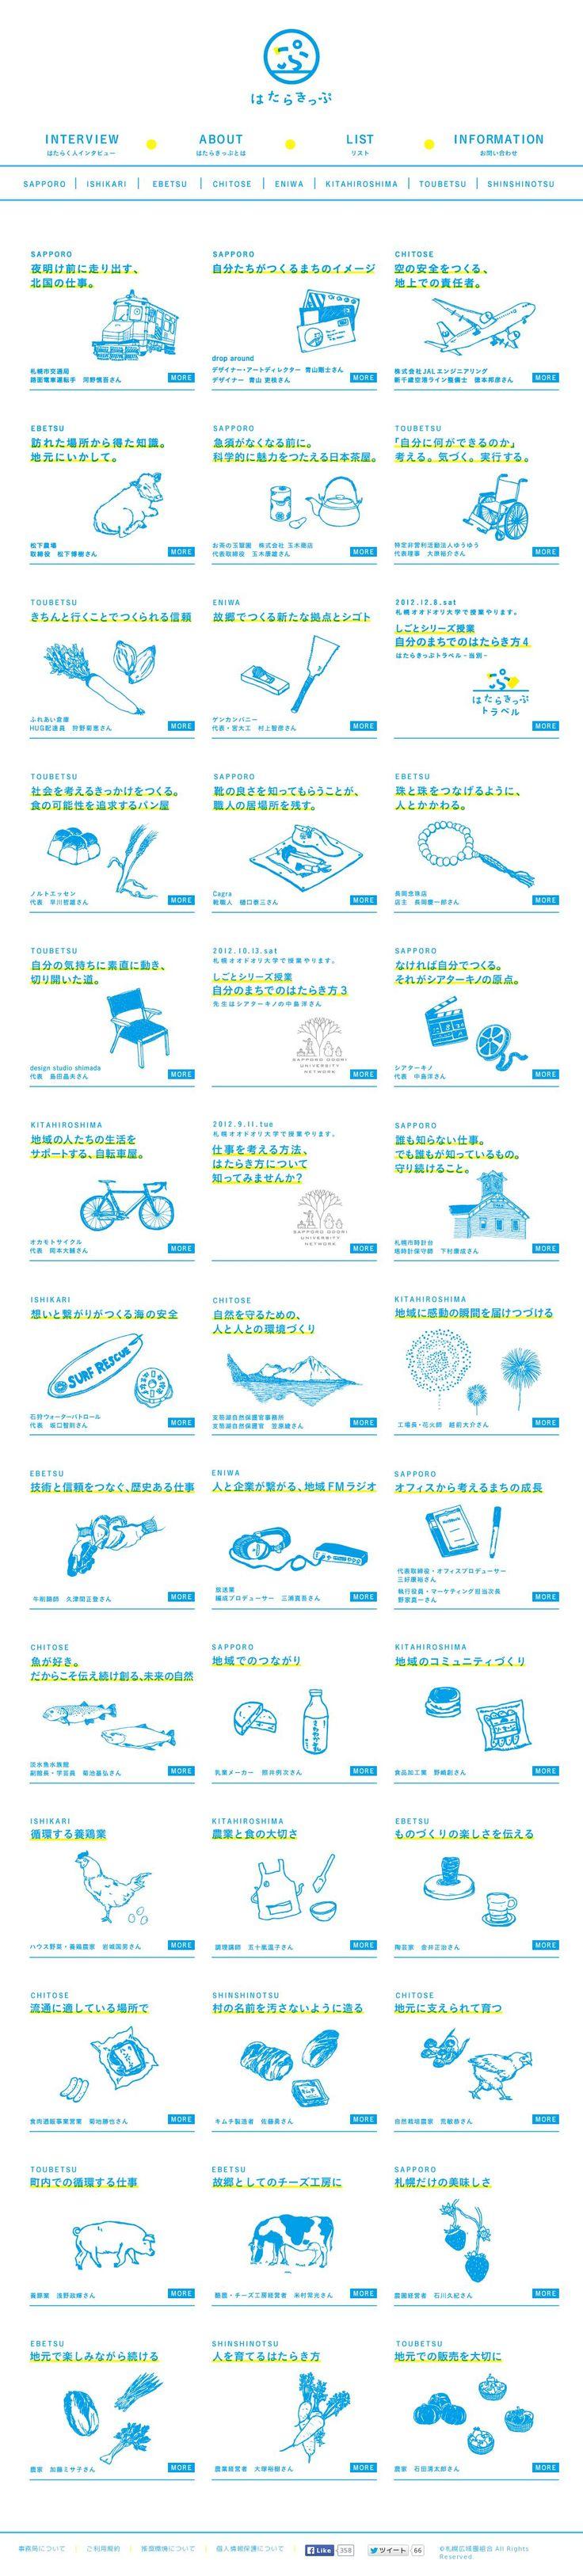 The website 'http://koukan-ryugaku.com/index.html' courtesy of @Pinstamatic (http://pinstamatic.com)